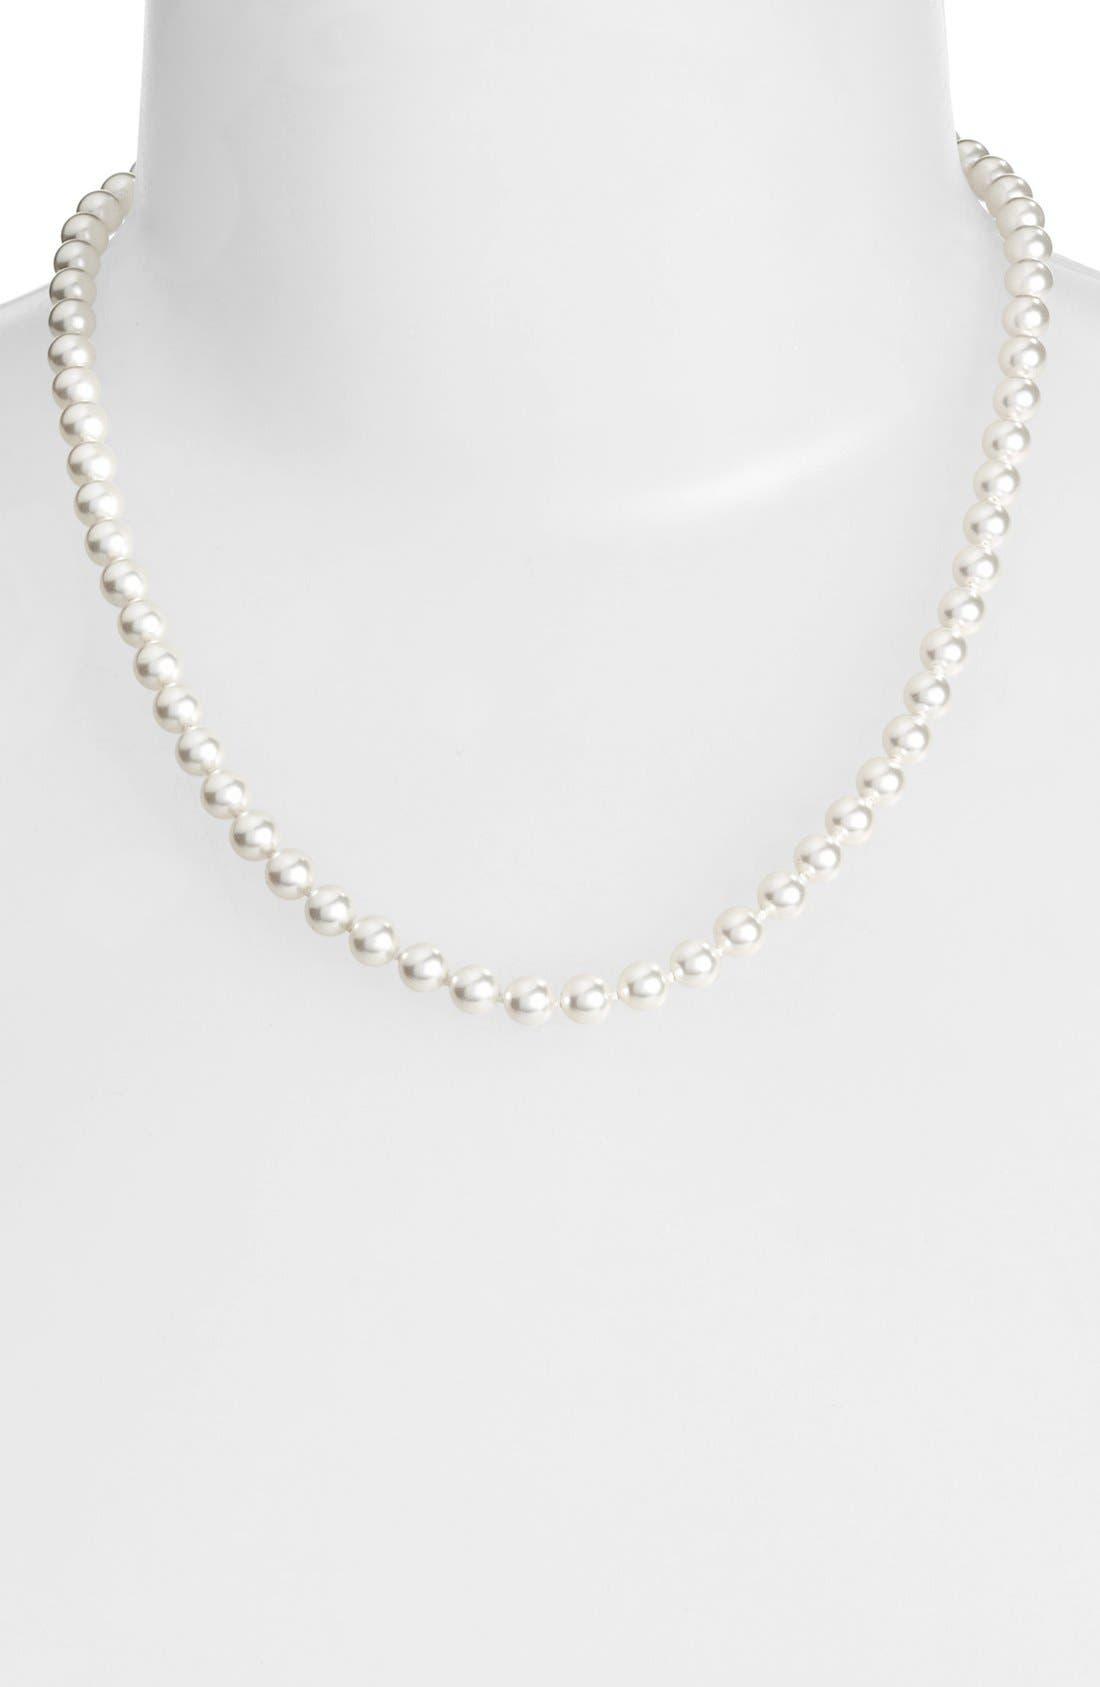 NadriImitationPearl Collar Necklace